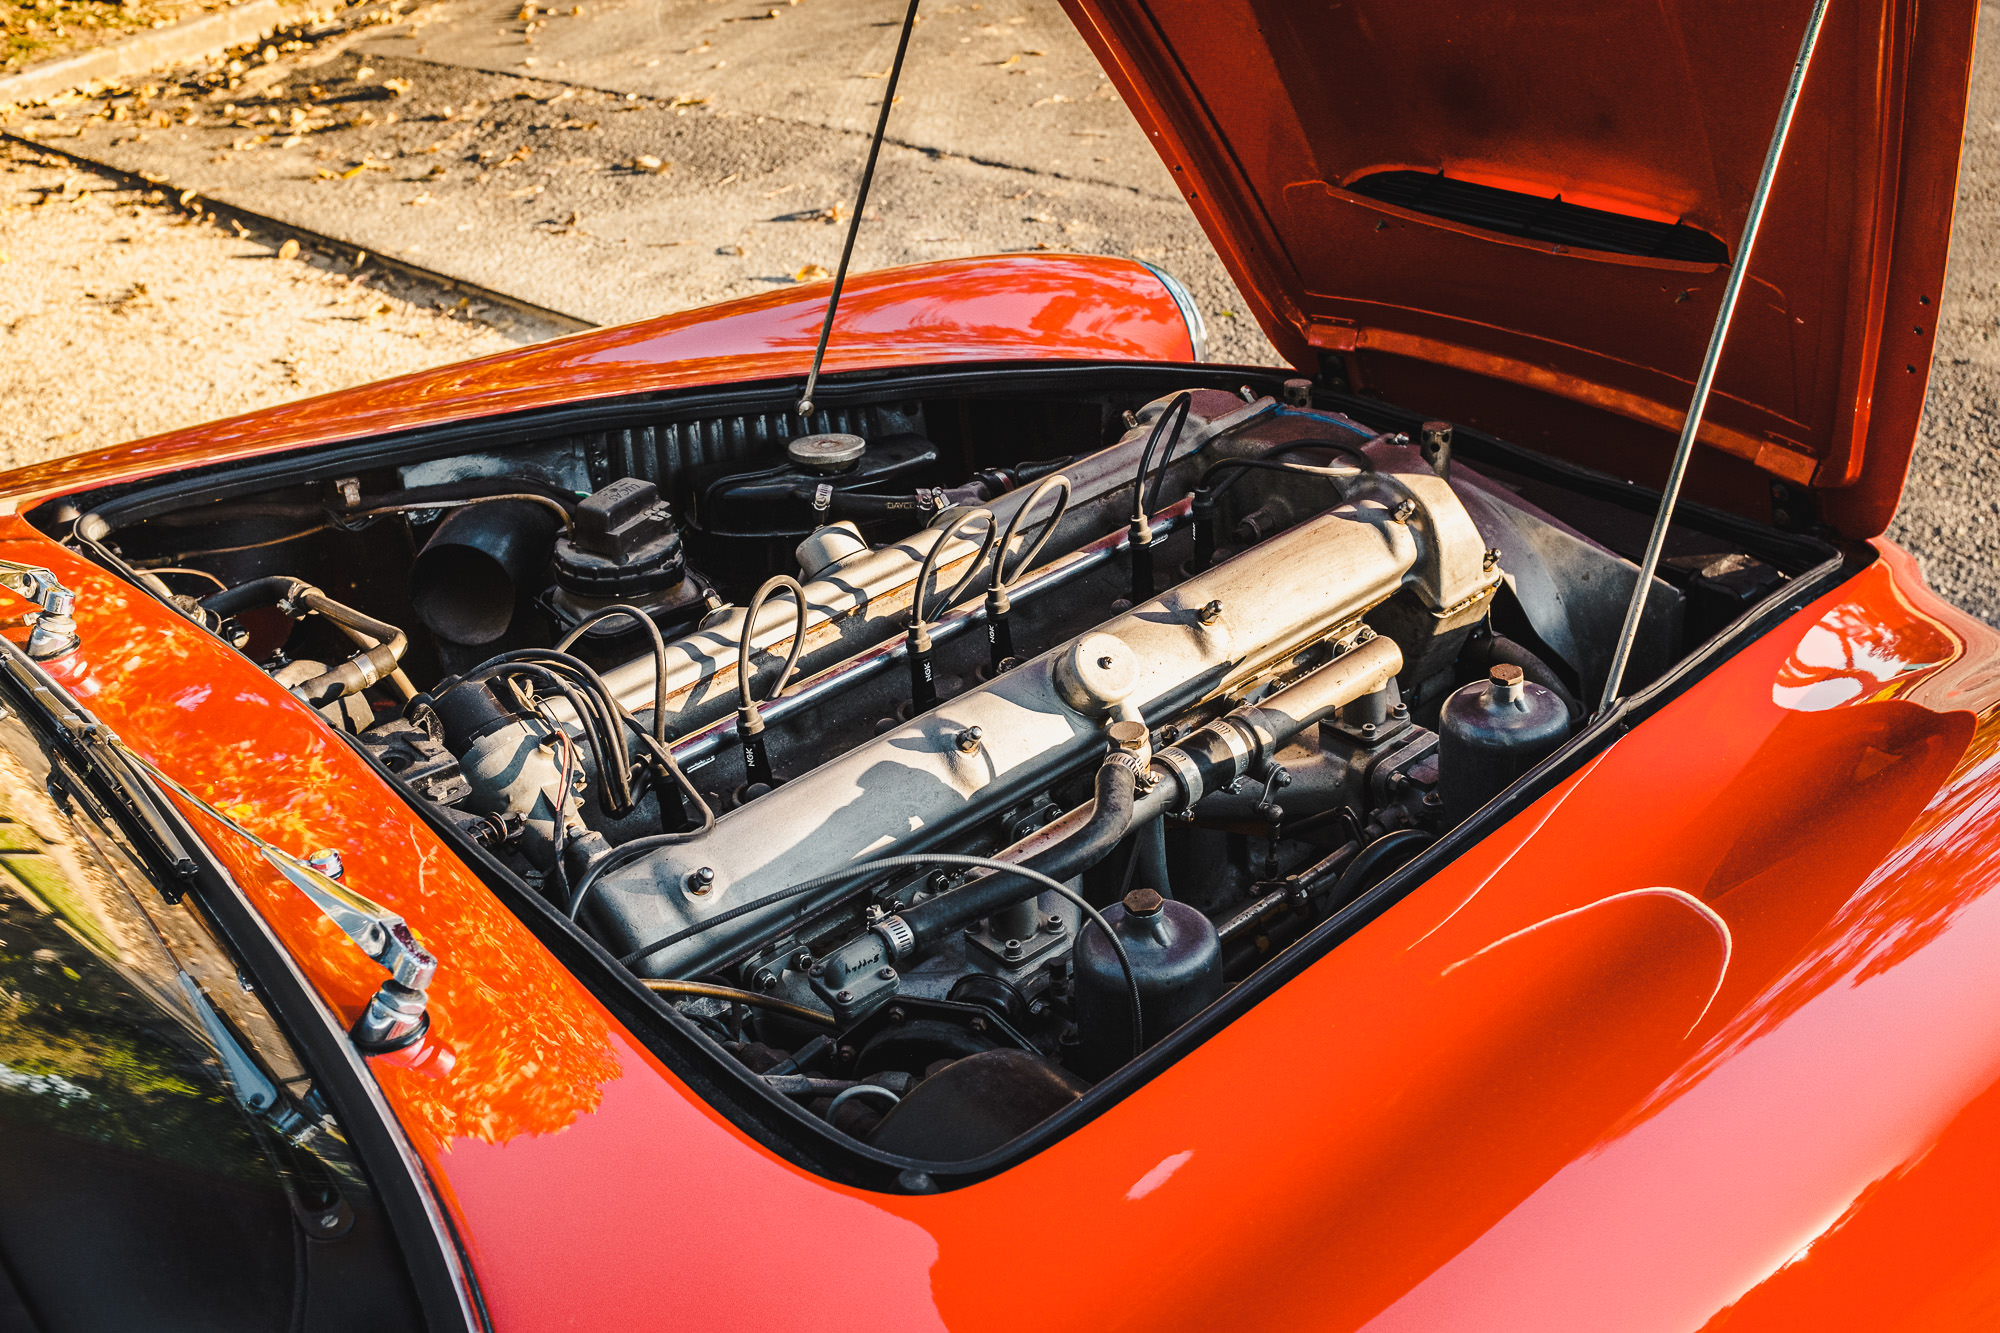 For Sale A Beautiful 1961 Aston Martin Db4